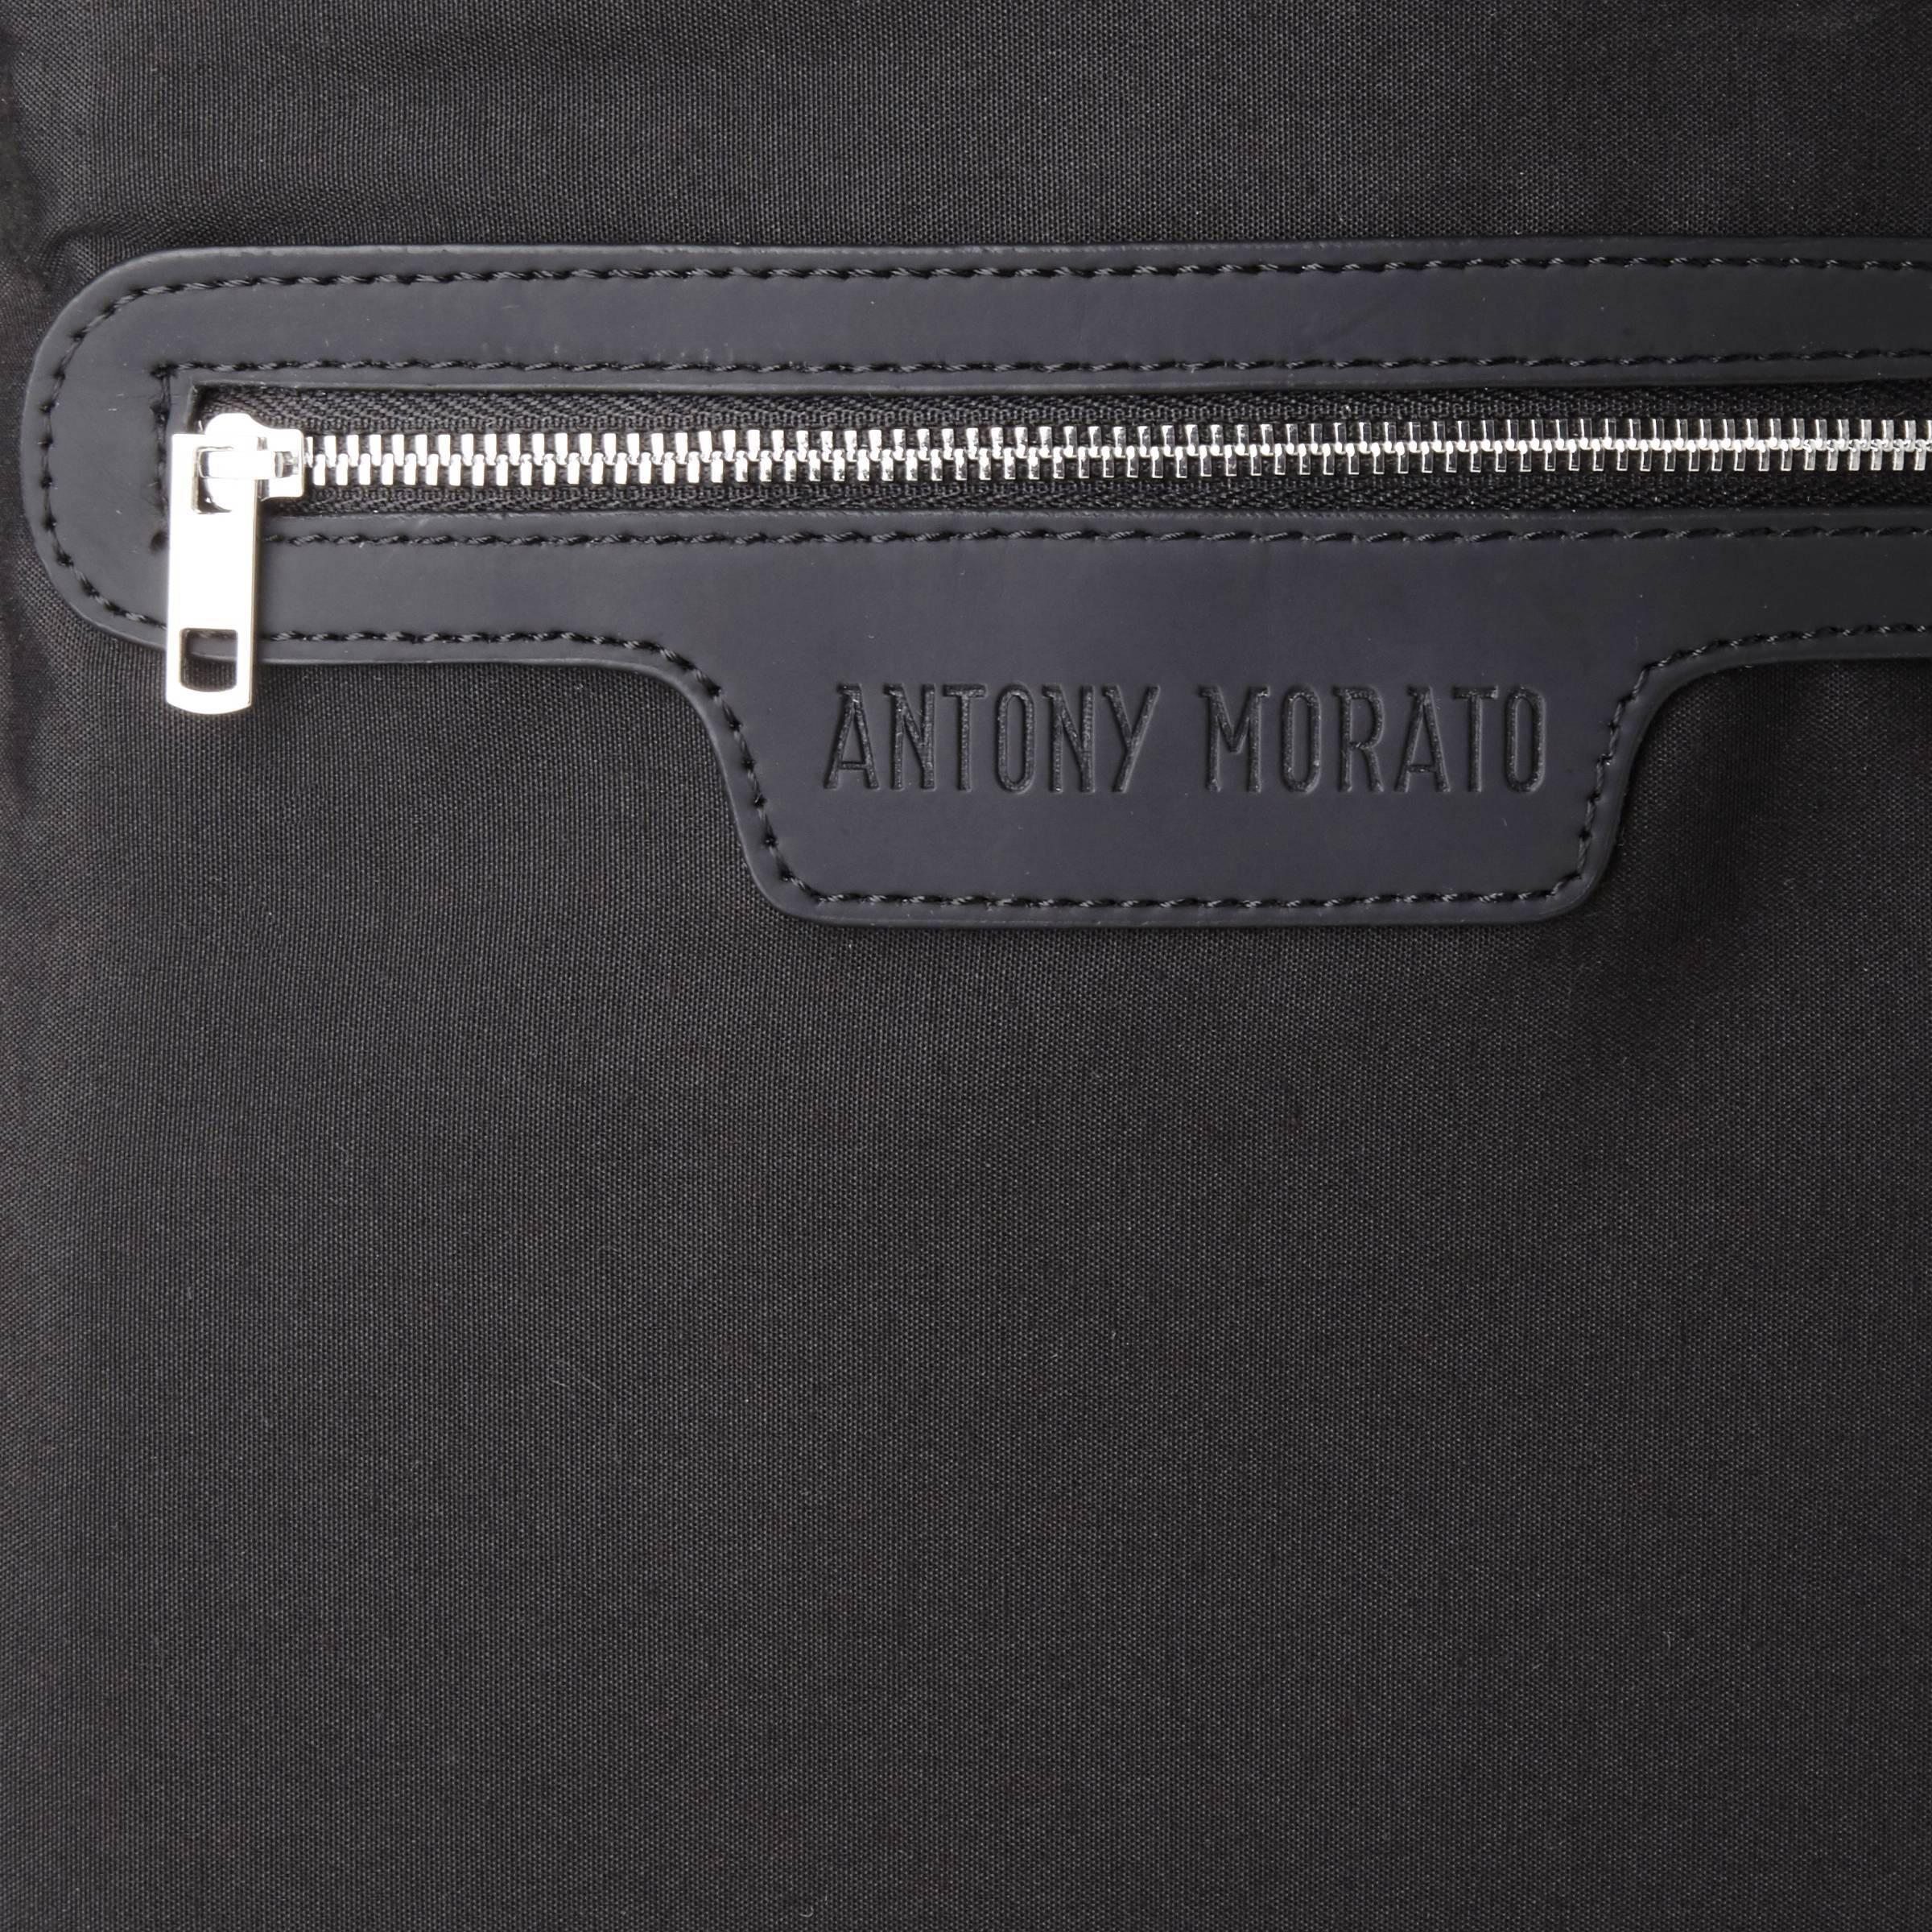 ca465ea49eef16 Antony Morato schoudertas | wehkamp